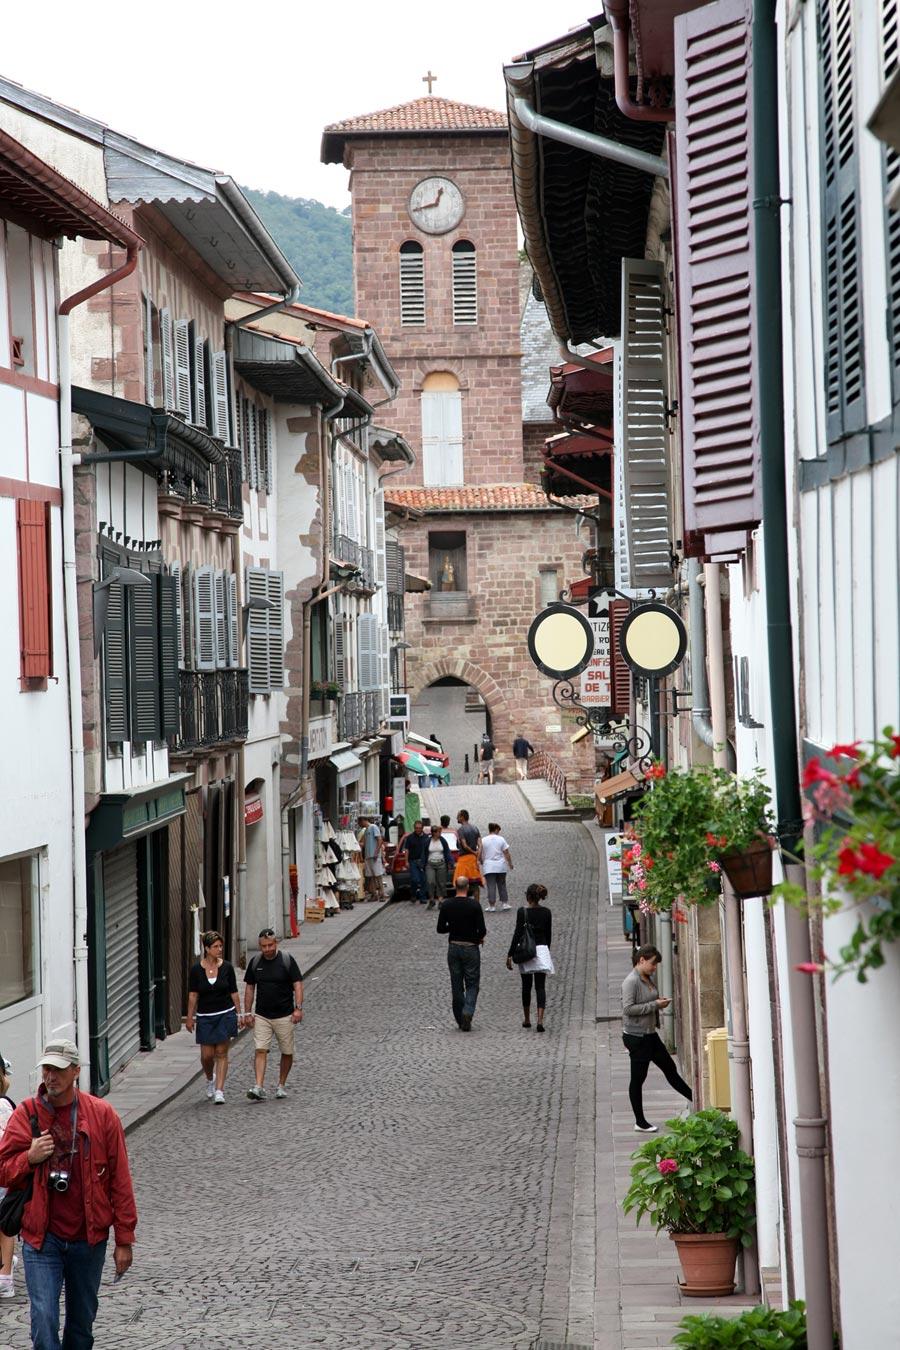 Saint jean pied de port saint jean pied de port - Office de tourisme saint jean pied de port ...